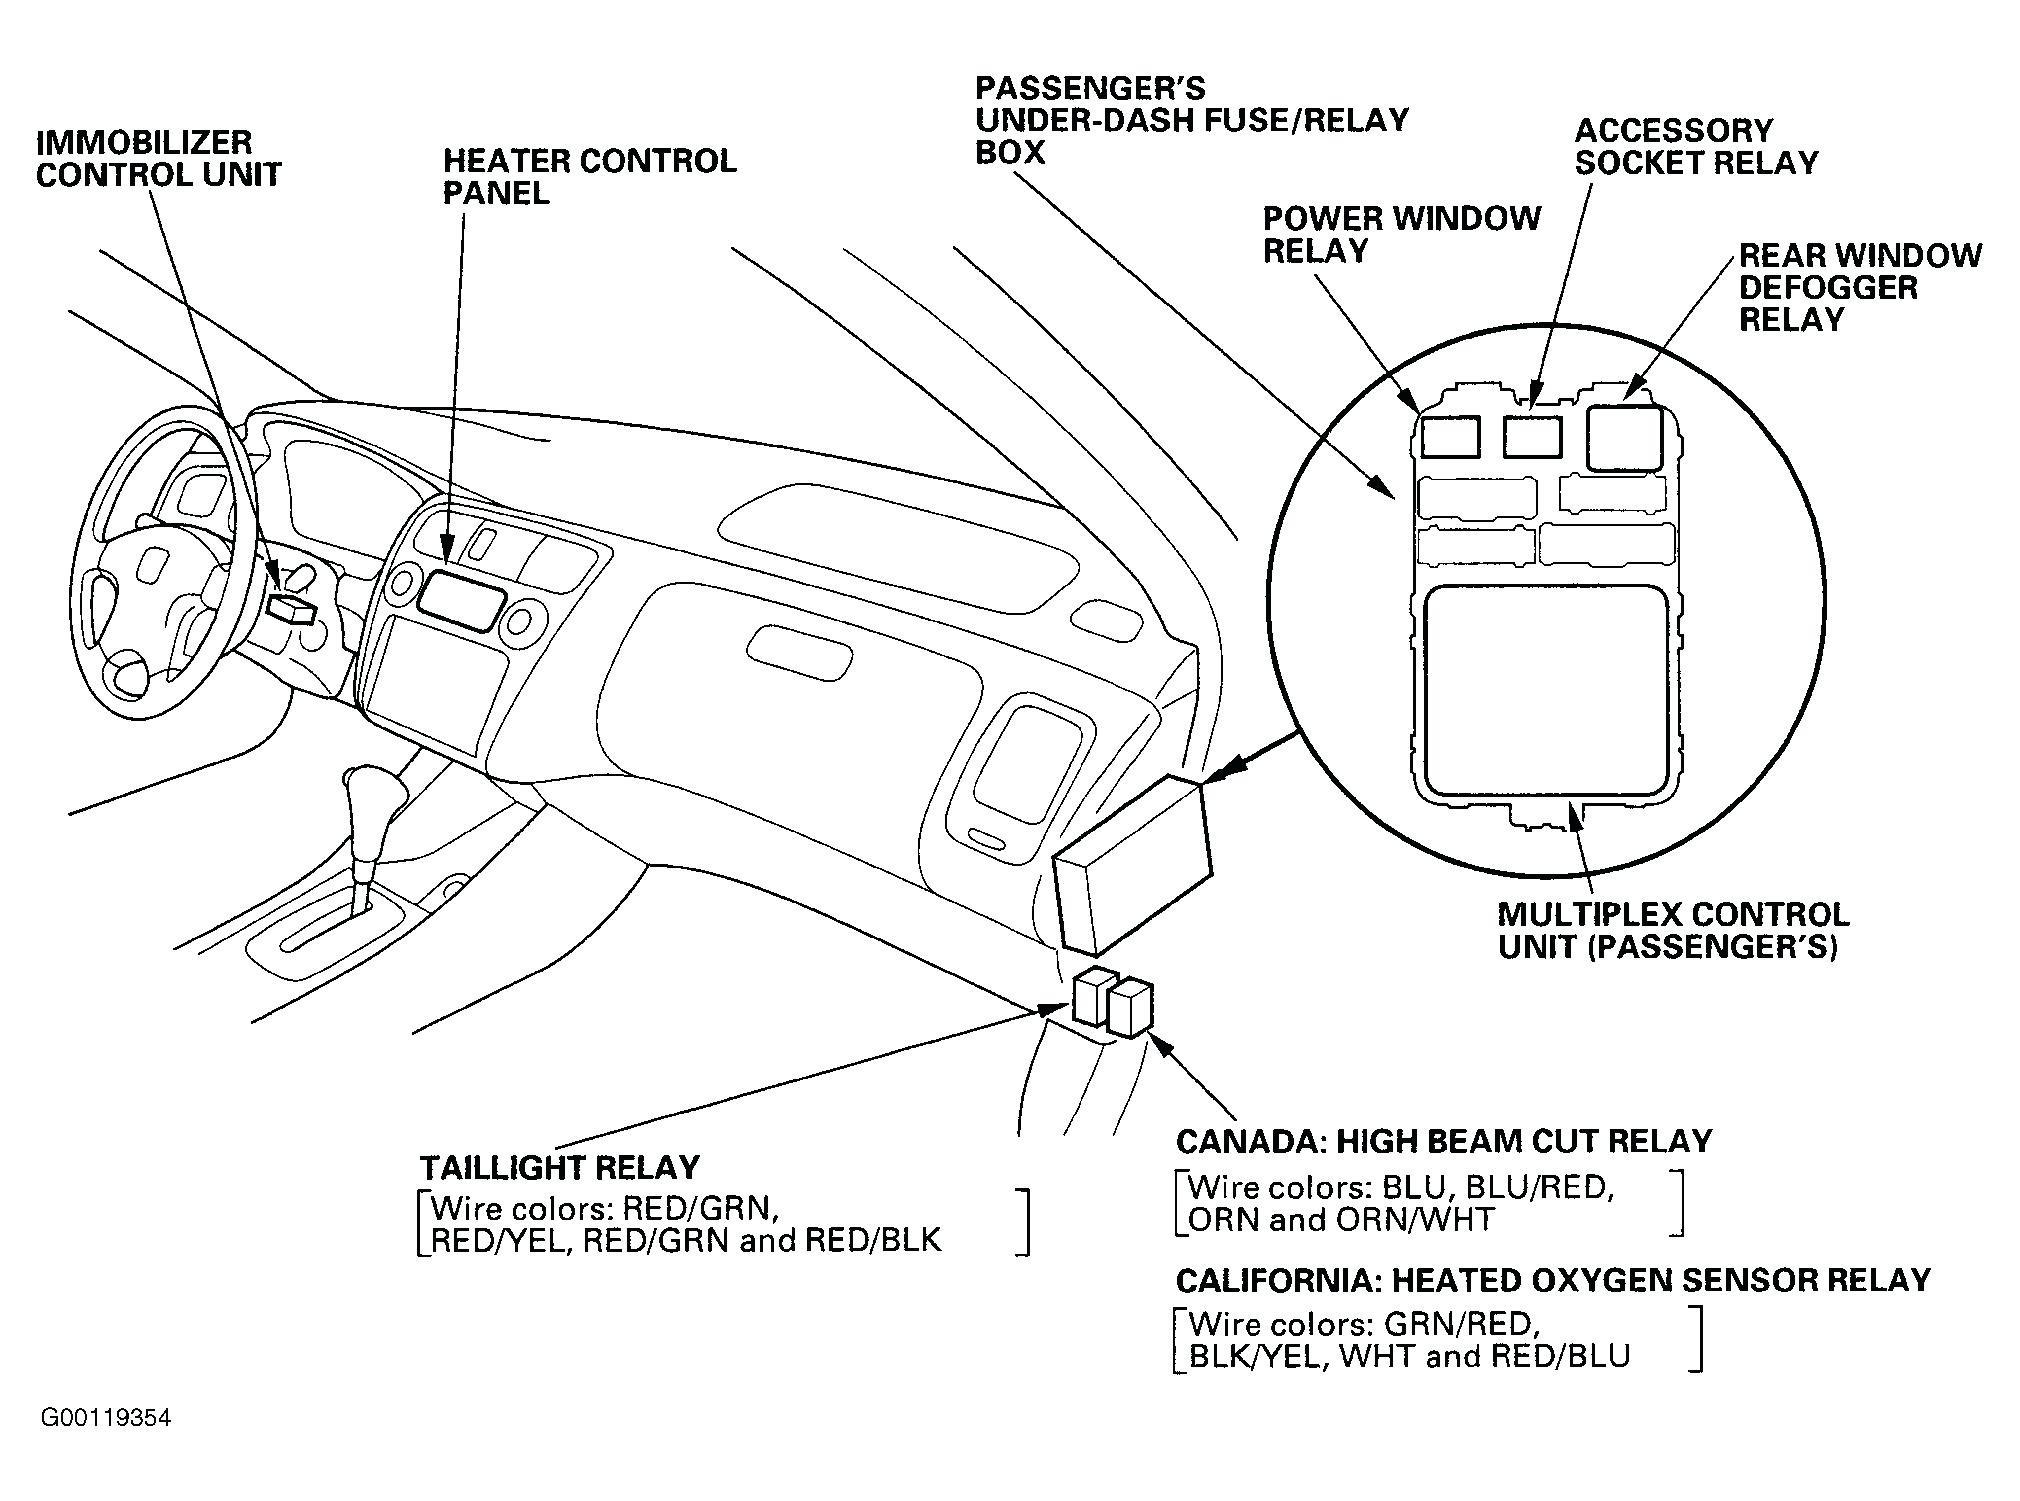 nissan pathfinder lift kit on 1997 nissan pathfinder engine diagram rh 10 sfewq raphaela knipp de